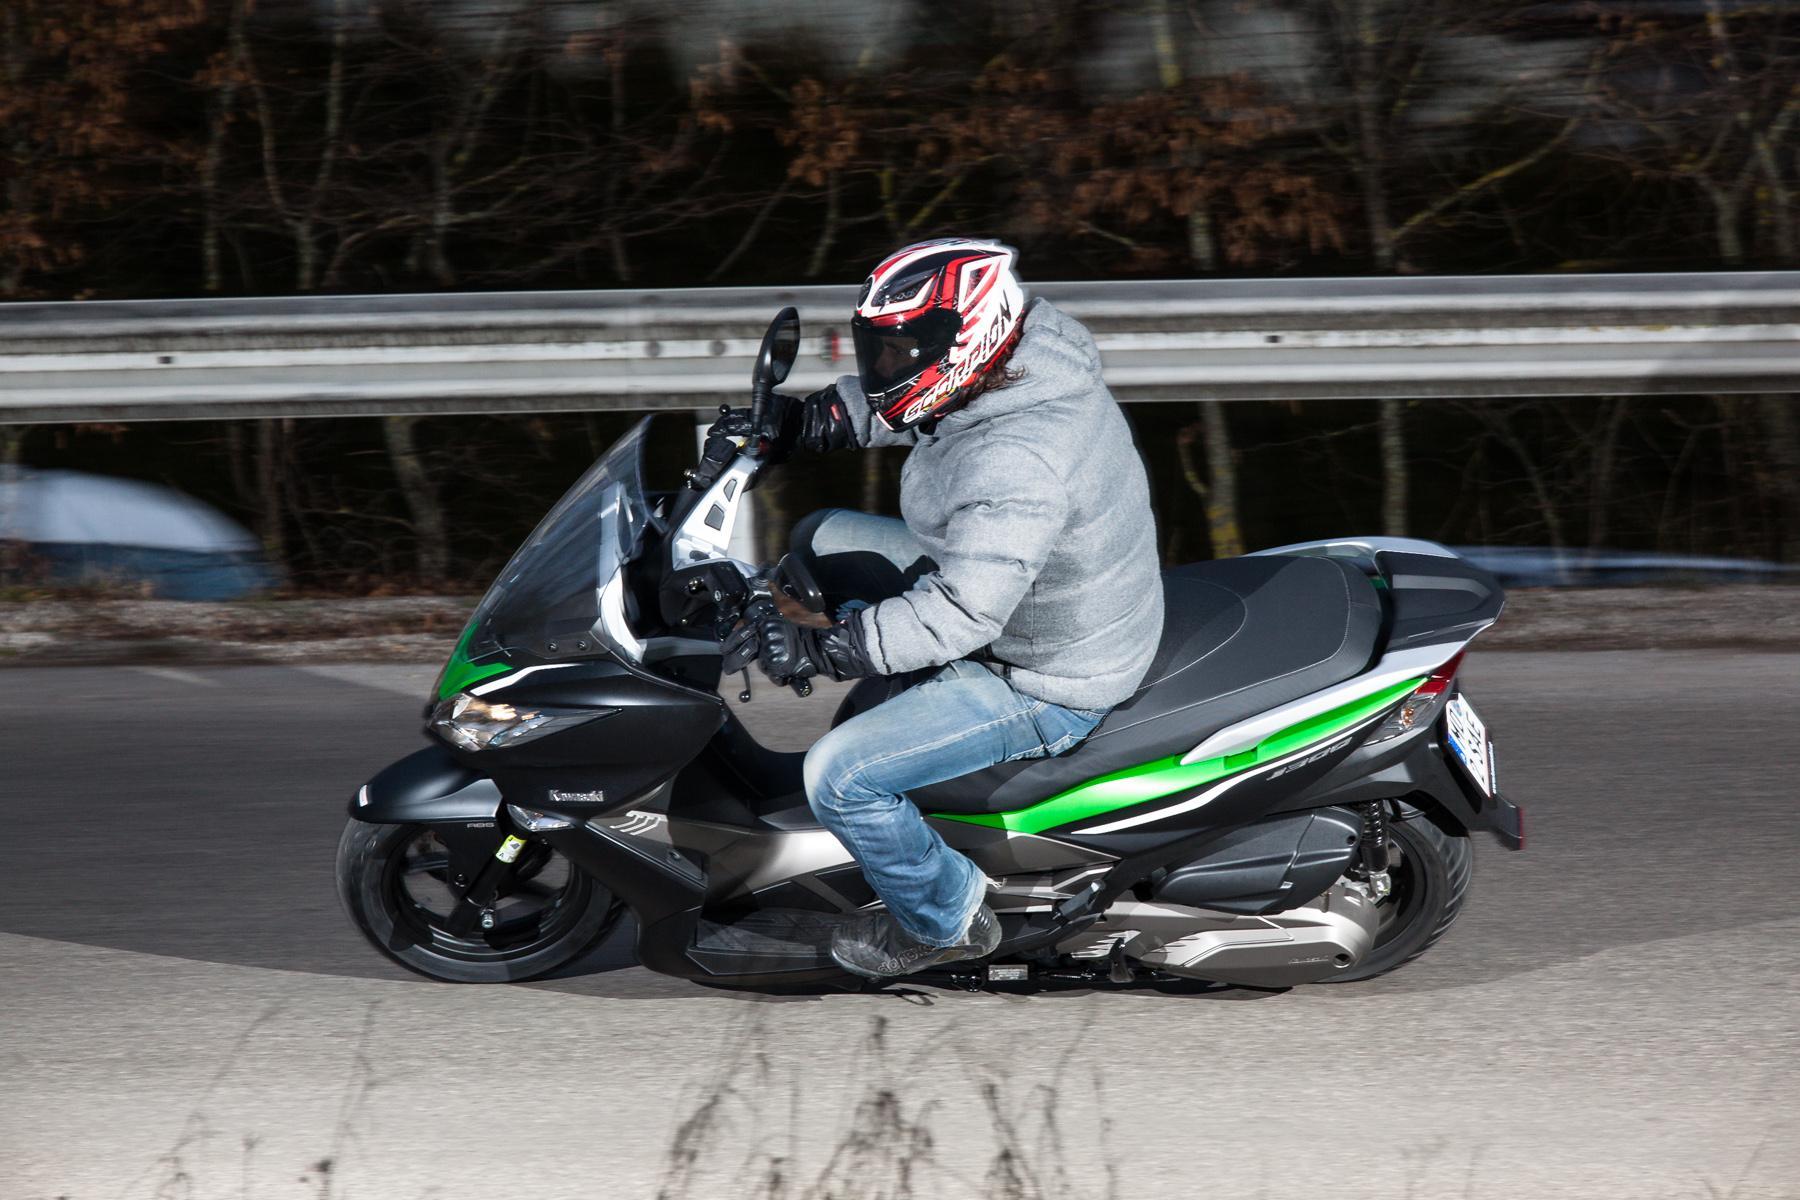 http://www.motorrad-bilder.at/slideshows/291/010647/kawasaki_j300_roller-41.jpg